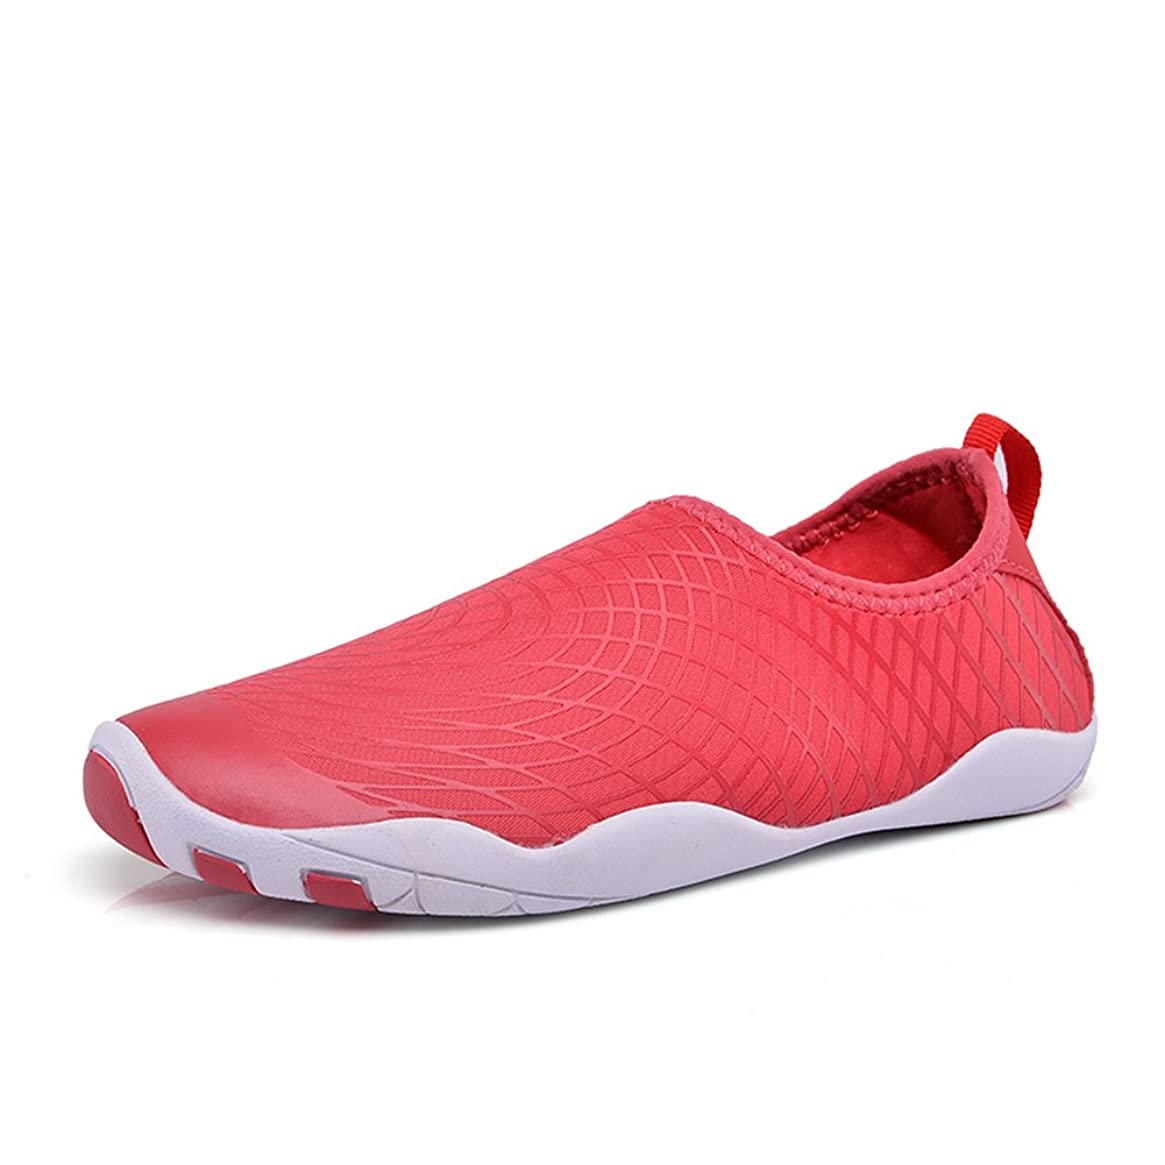 Kitleler Water Shoes Men Women Barefoot Quick-Dry Aqua Drainage Hole Beach Yoga Swimming